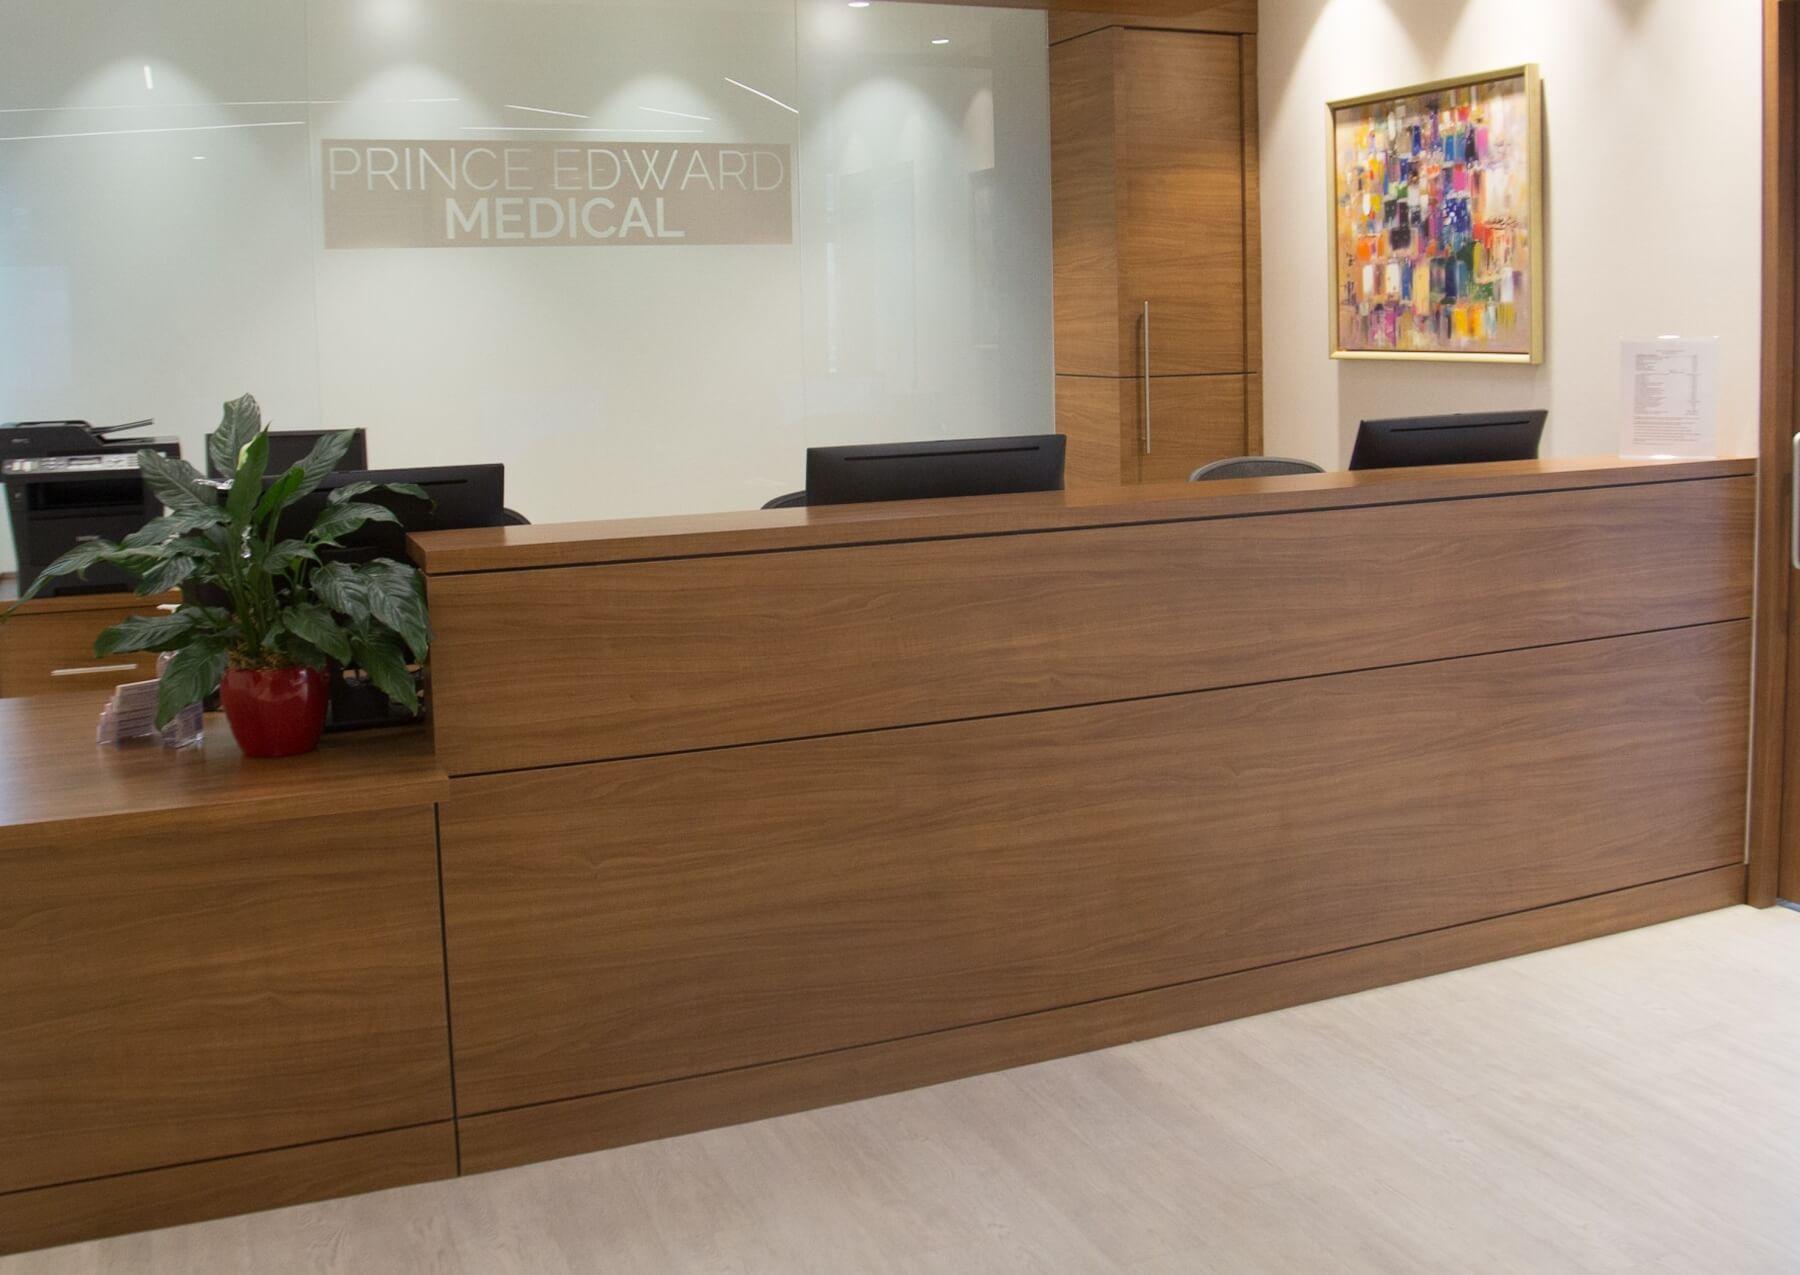 Prince Edward Medical Clinic-0298